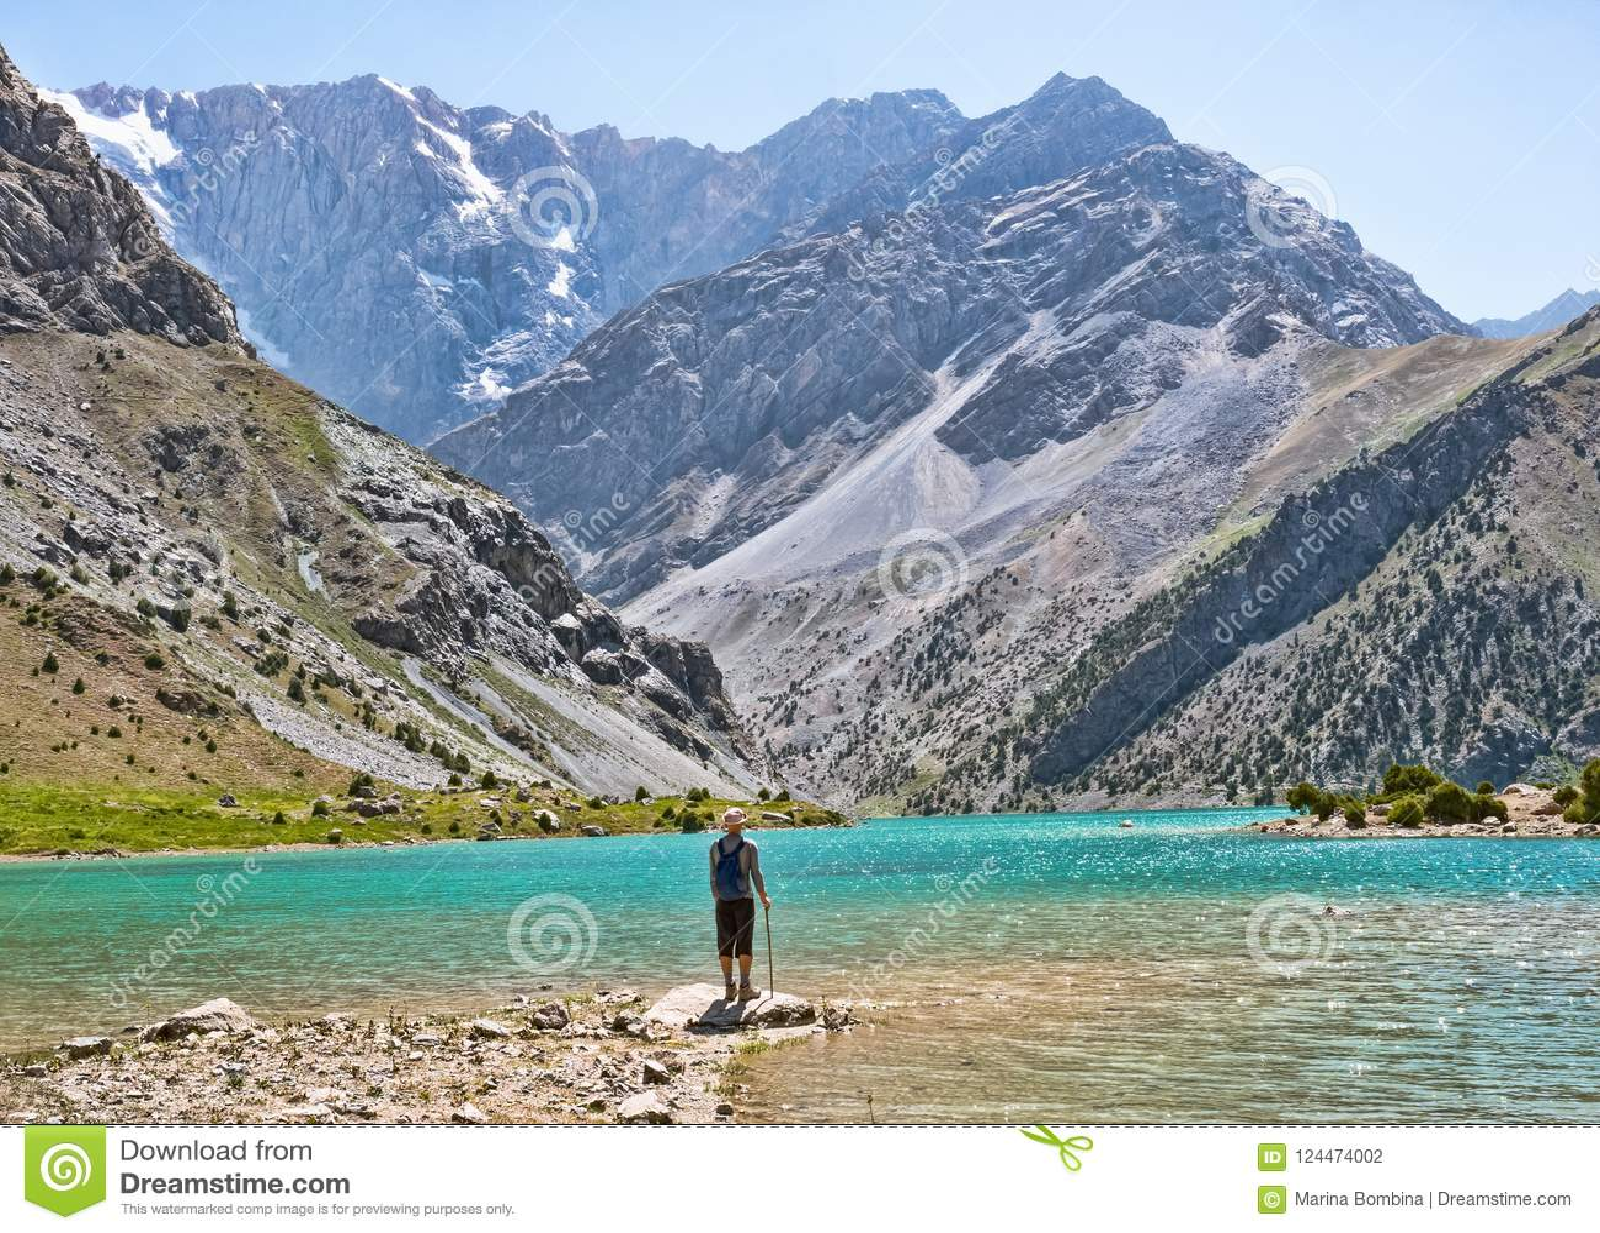 Caminante con la mochila cerca del lago Kulikalon en la montaña rocosa